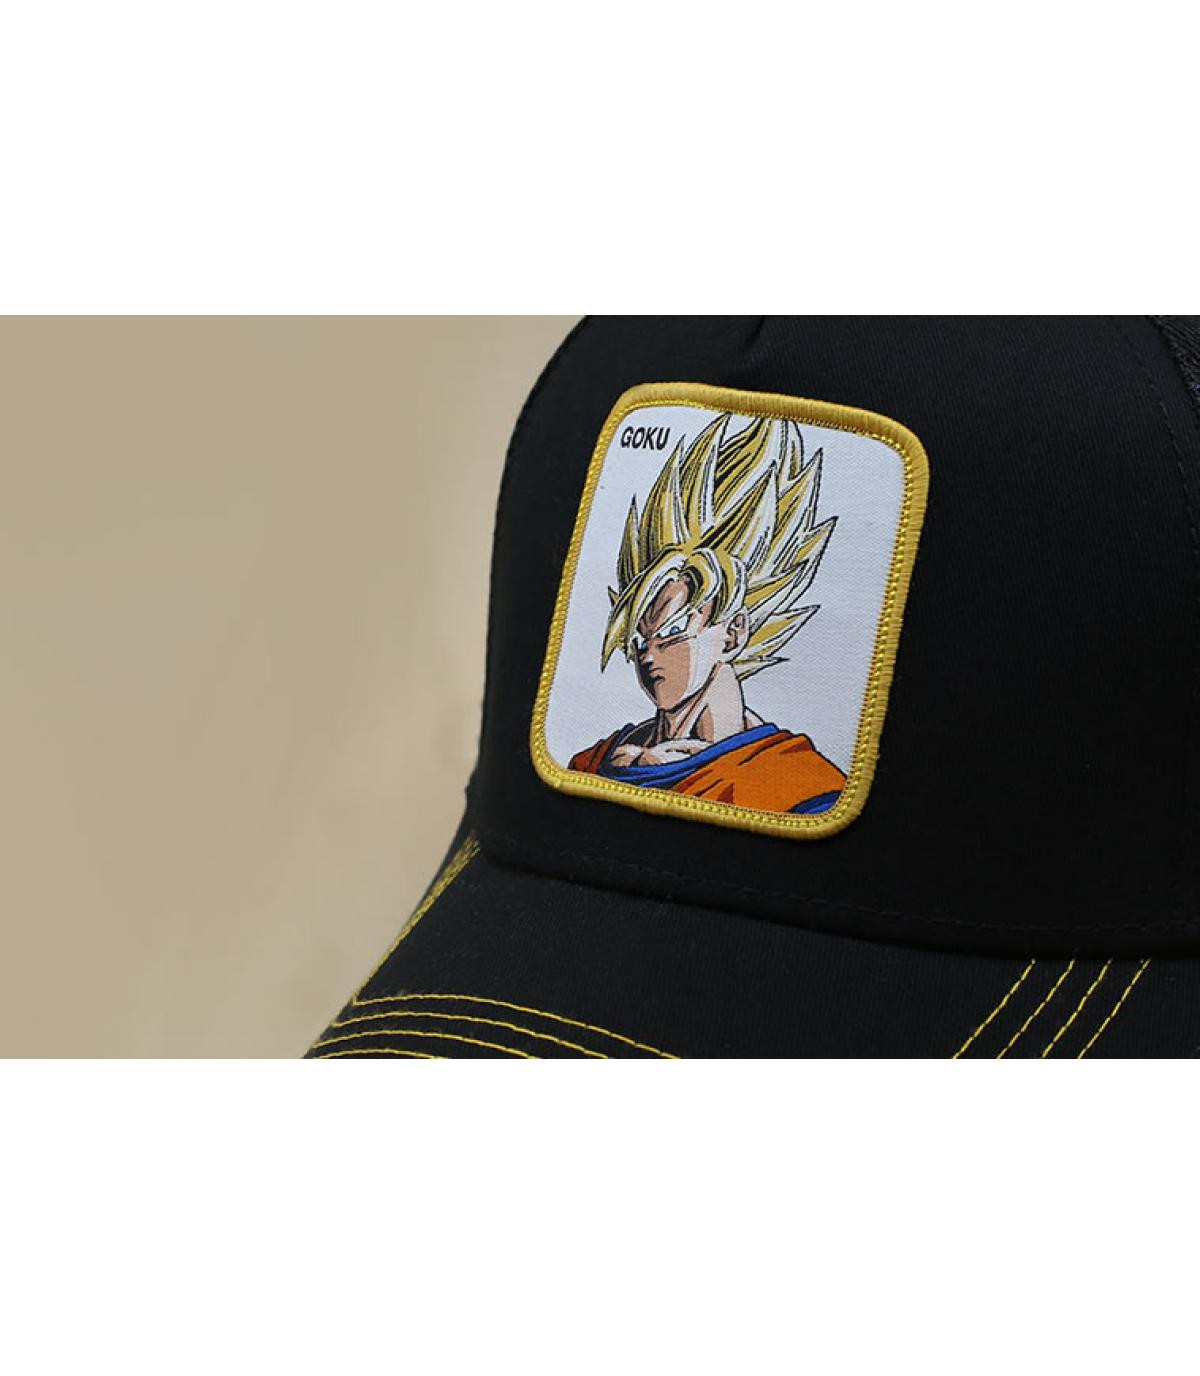 Détails Trucker DBZ Son Goku 2 - image 3